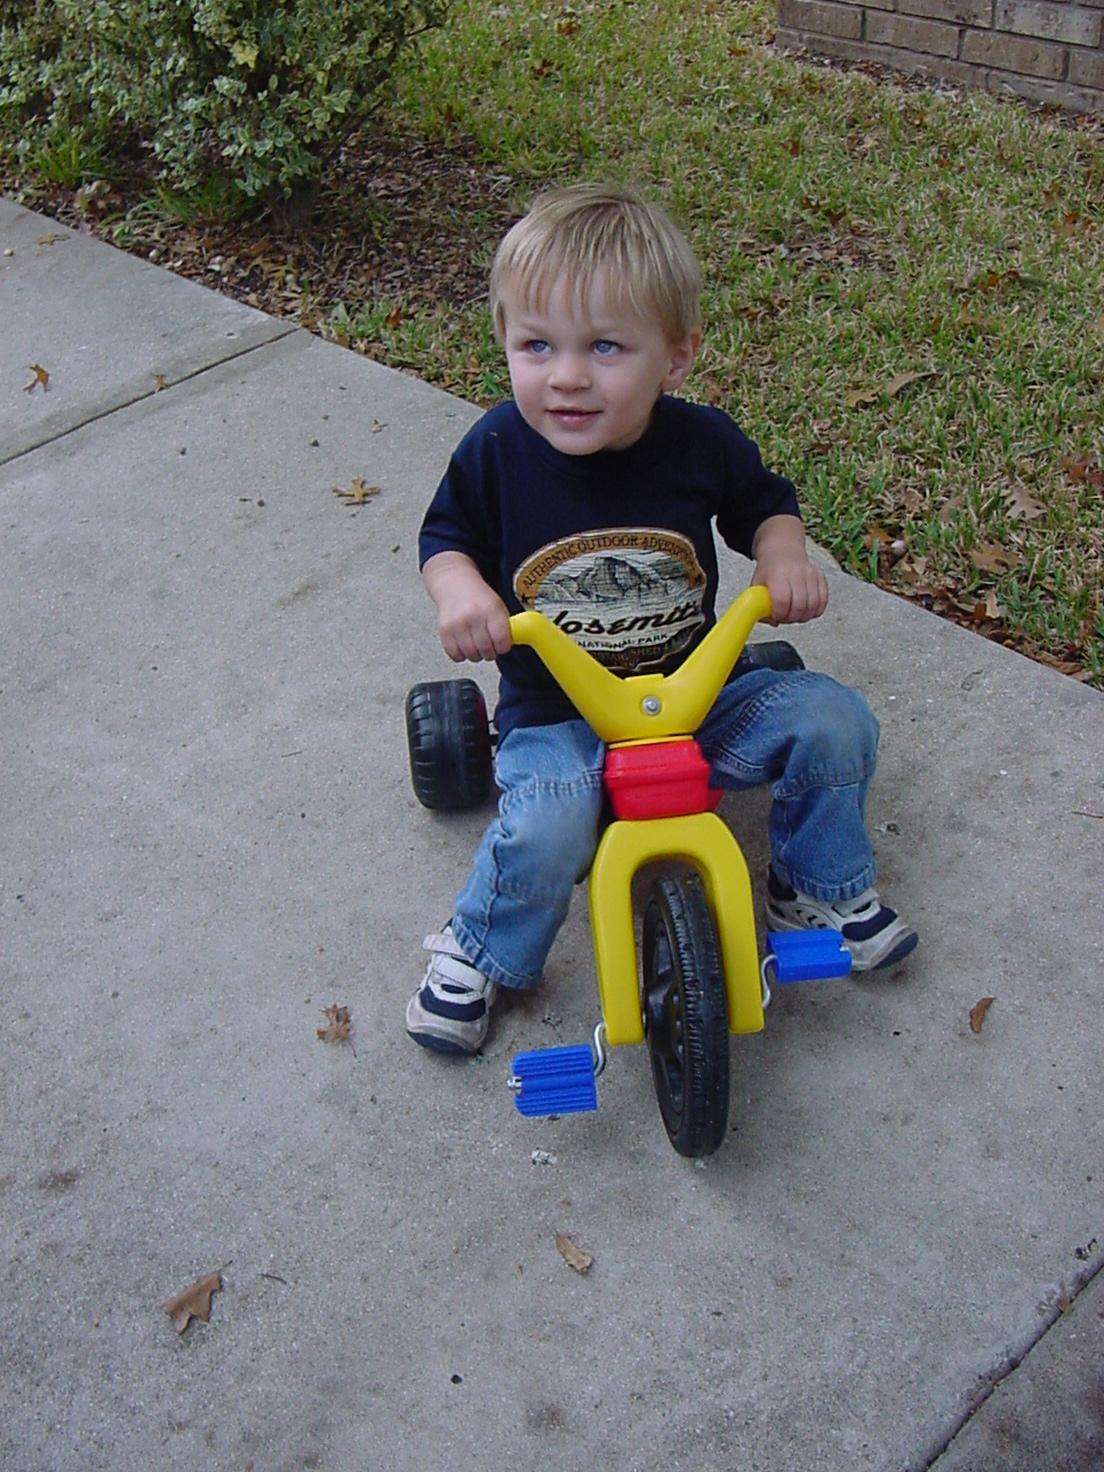 2008-11-27-big-wheels-12.JPG